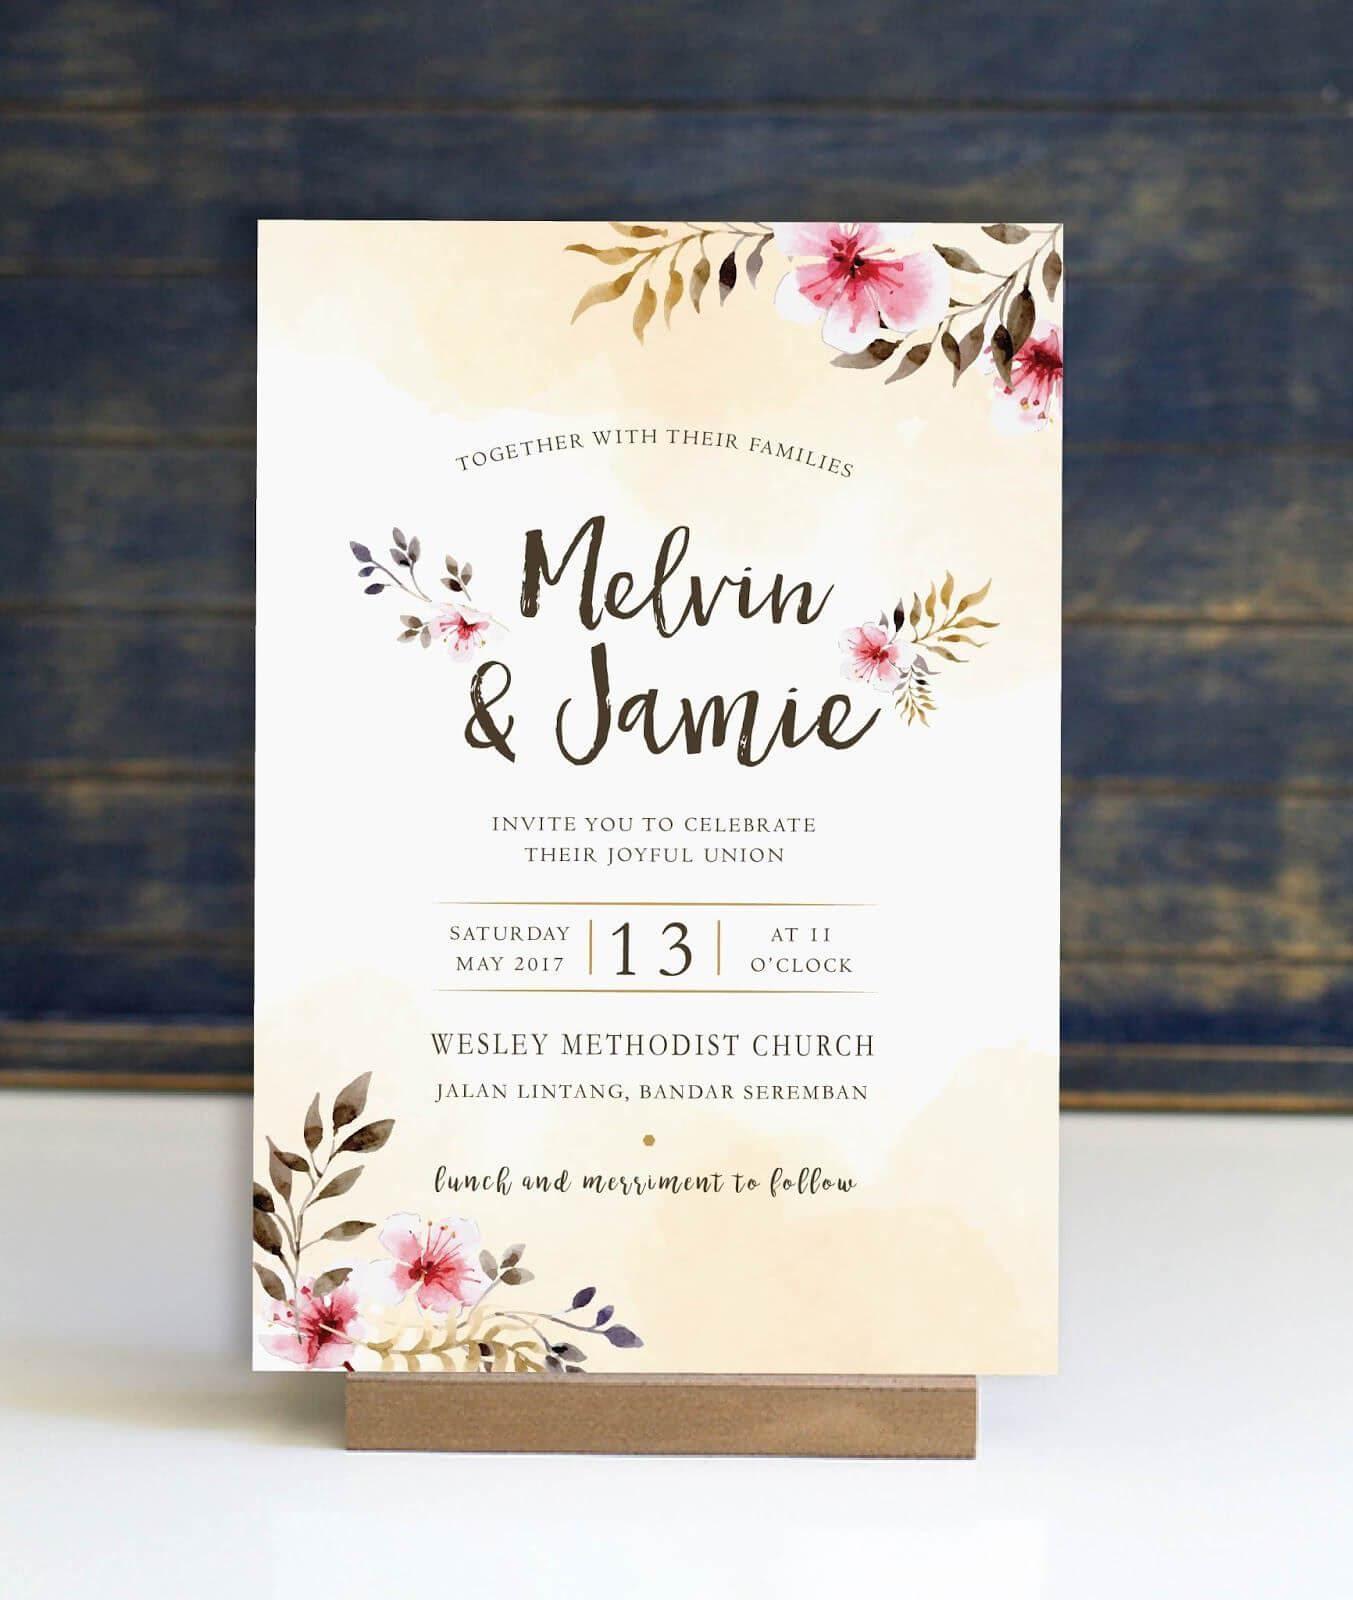 Church Invite Cards : Church Fundraising Invitation Cards For Church Wedding Invitation Card Template